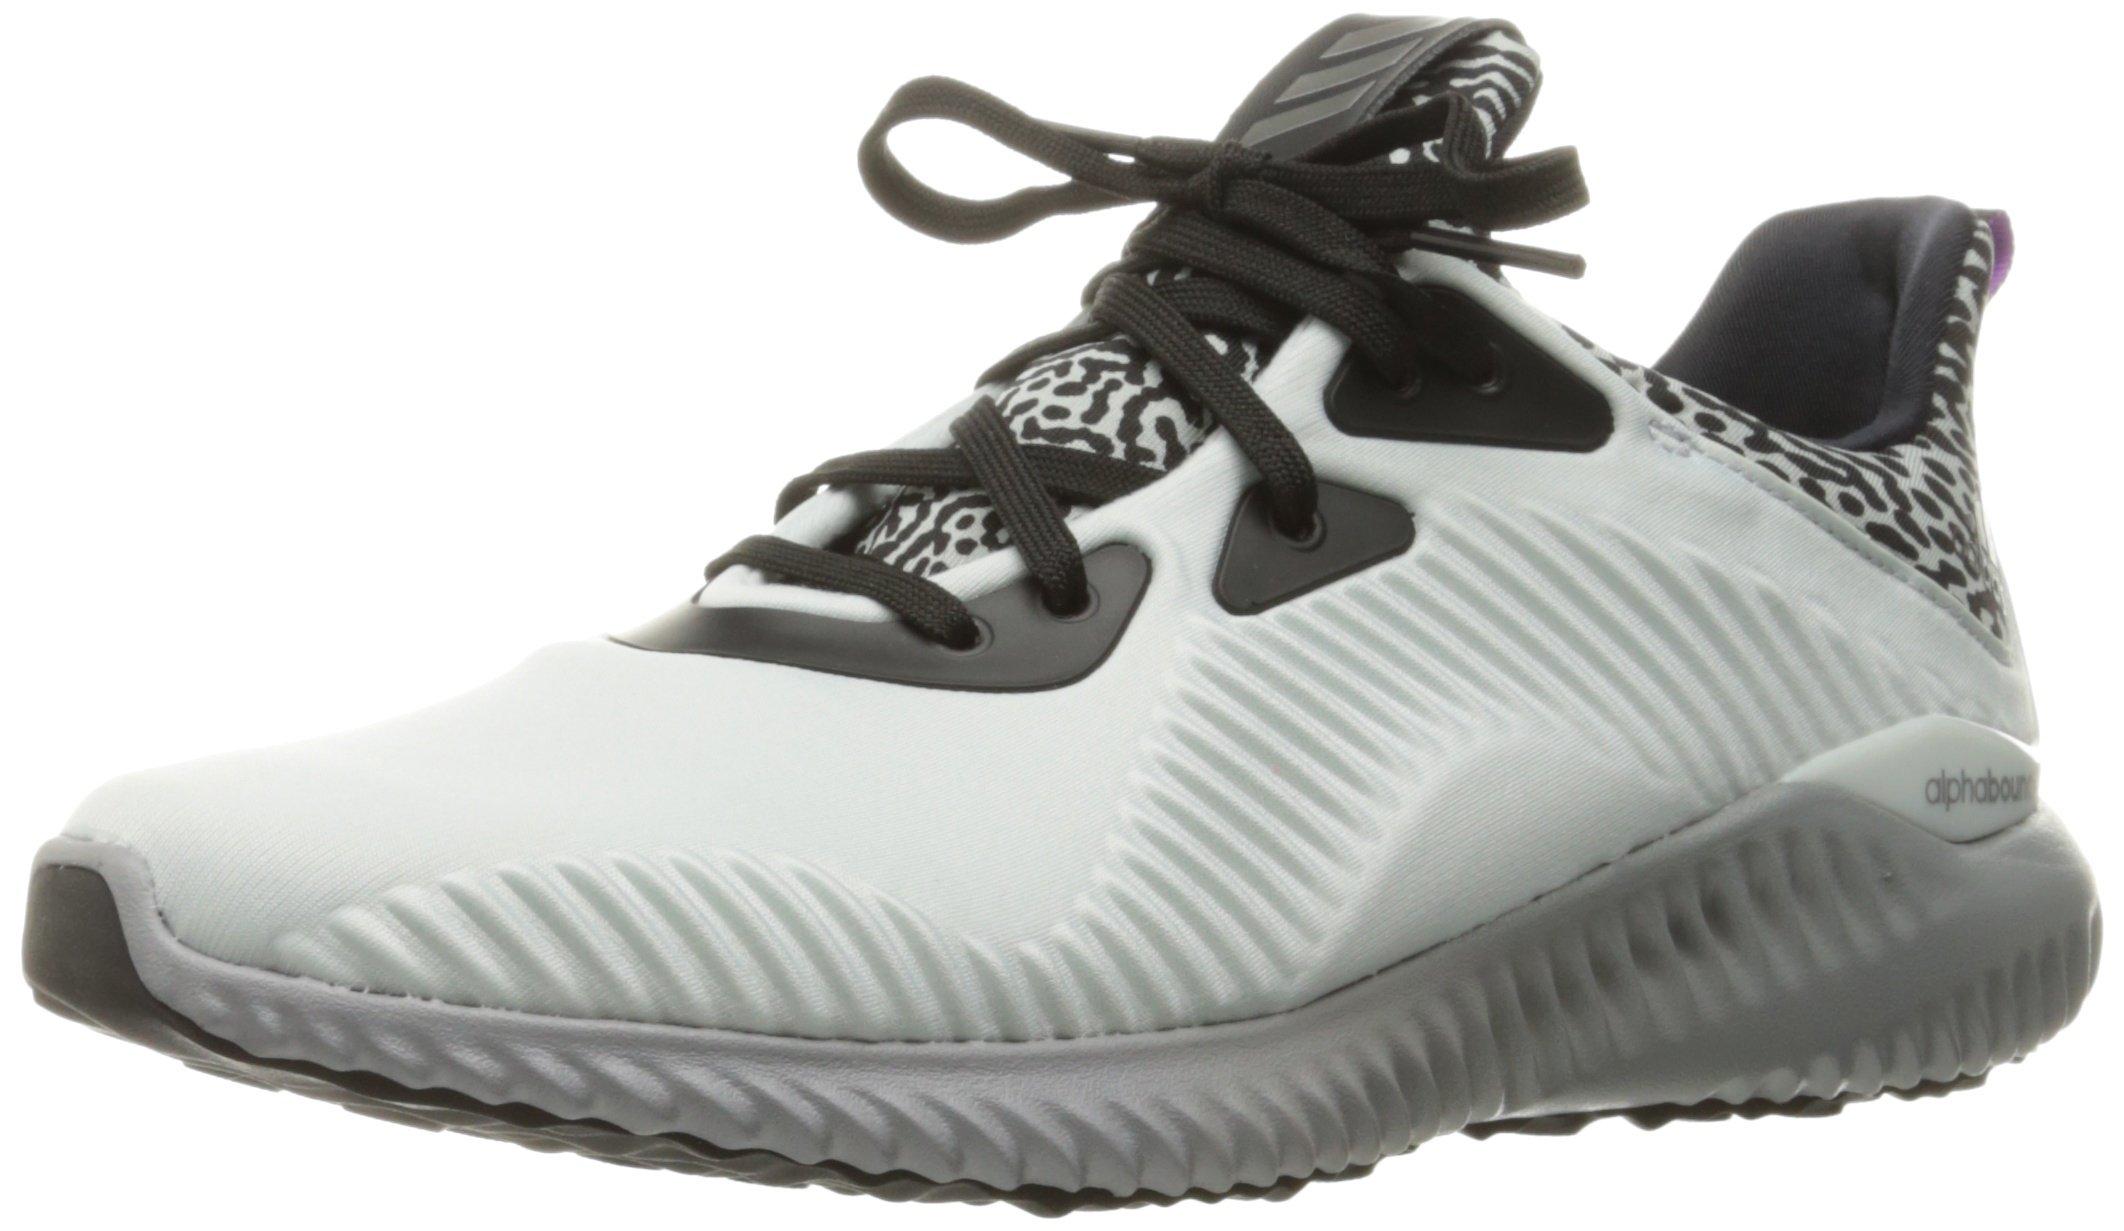 grand choix de 5f5ec a631b adidas Performance Women's Alphabounce w Running Shoe, Crystal White / Neo  Iron Metallic Aluminum, 7 M US